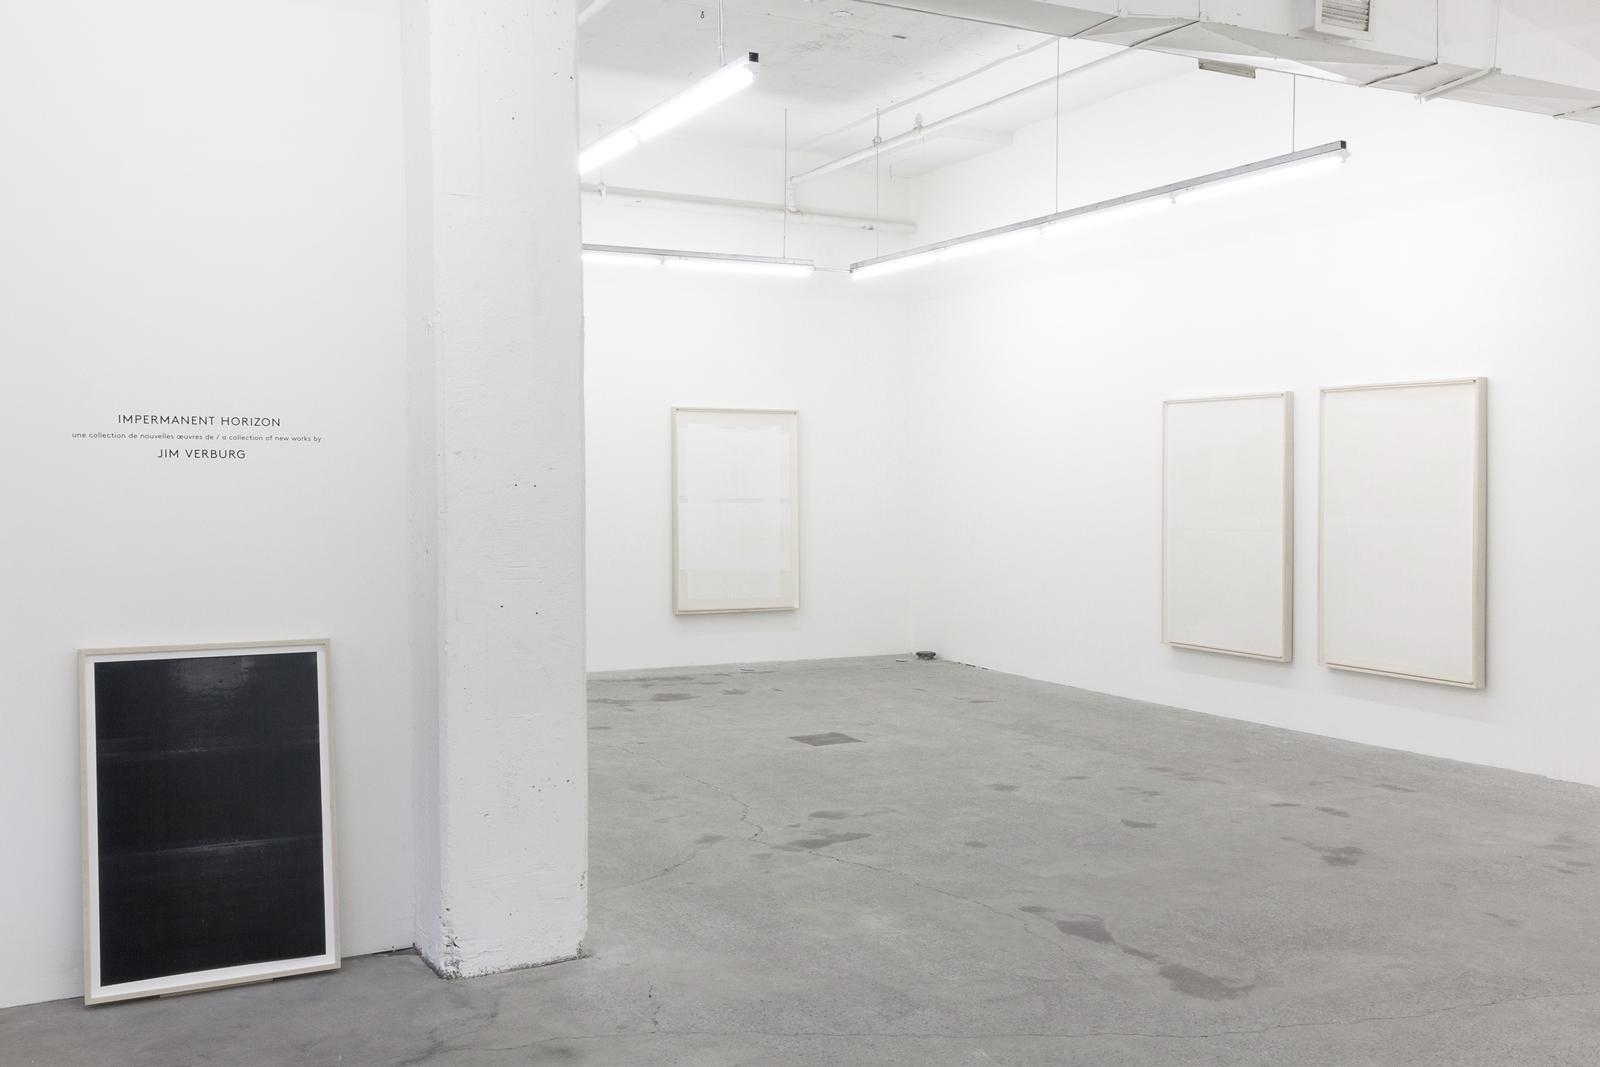 Installation View, Impermanent Horizon, Galerie Nicolas Robert